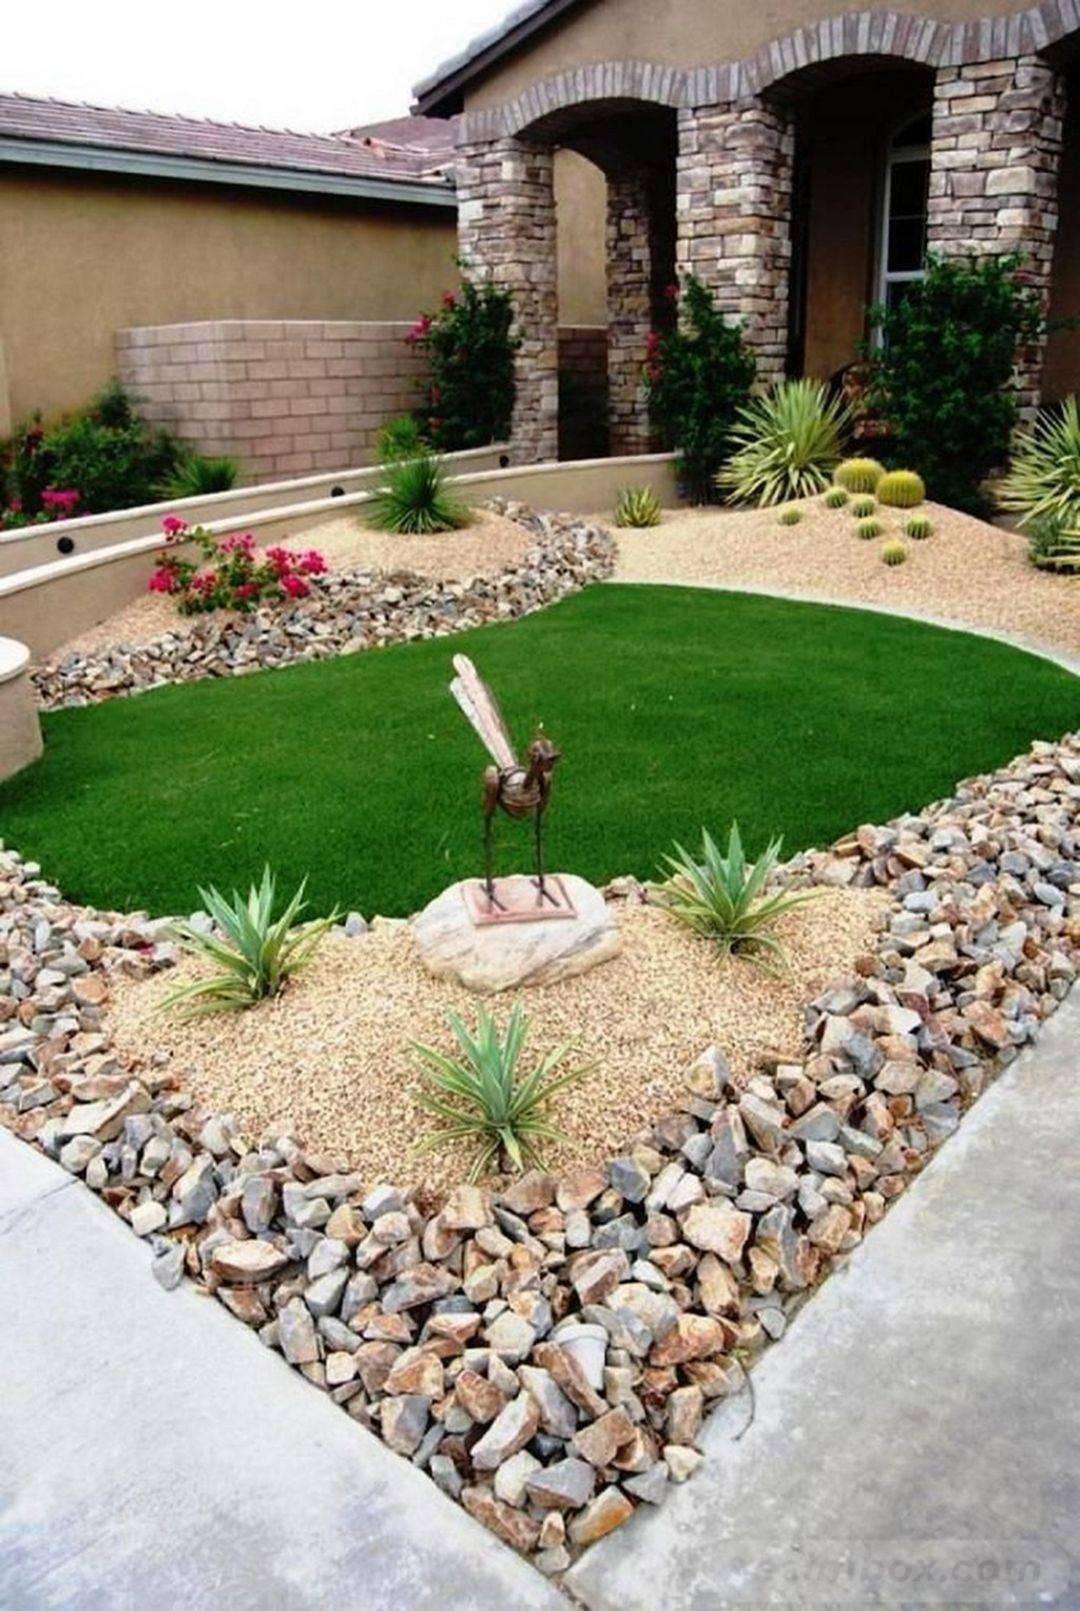 amazing garden ideas-597219600567127250